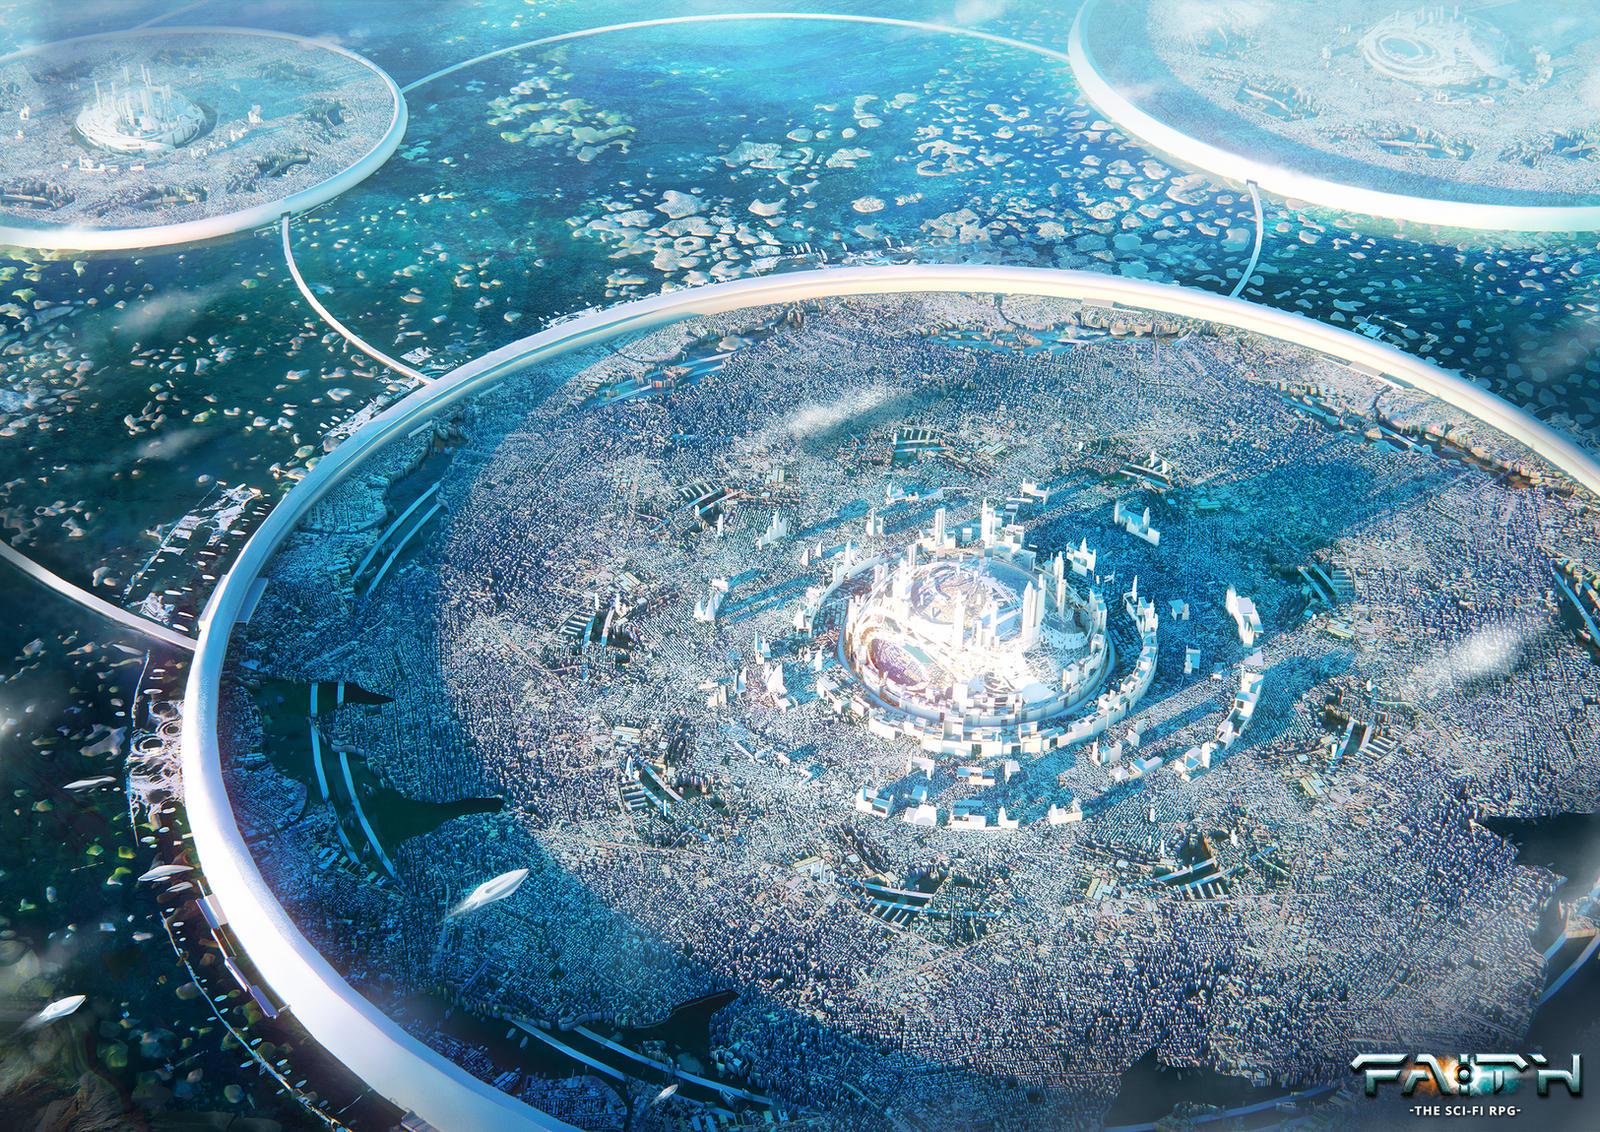 Faith - alameen planet